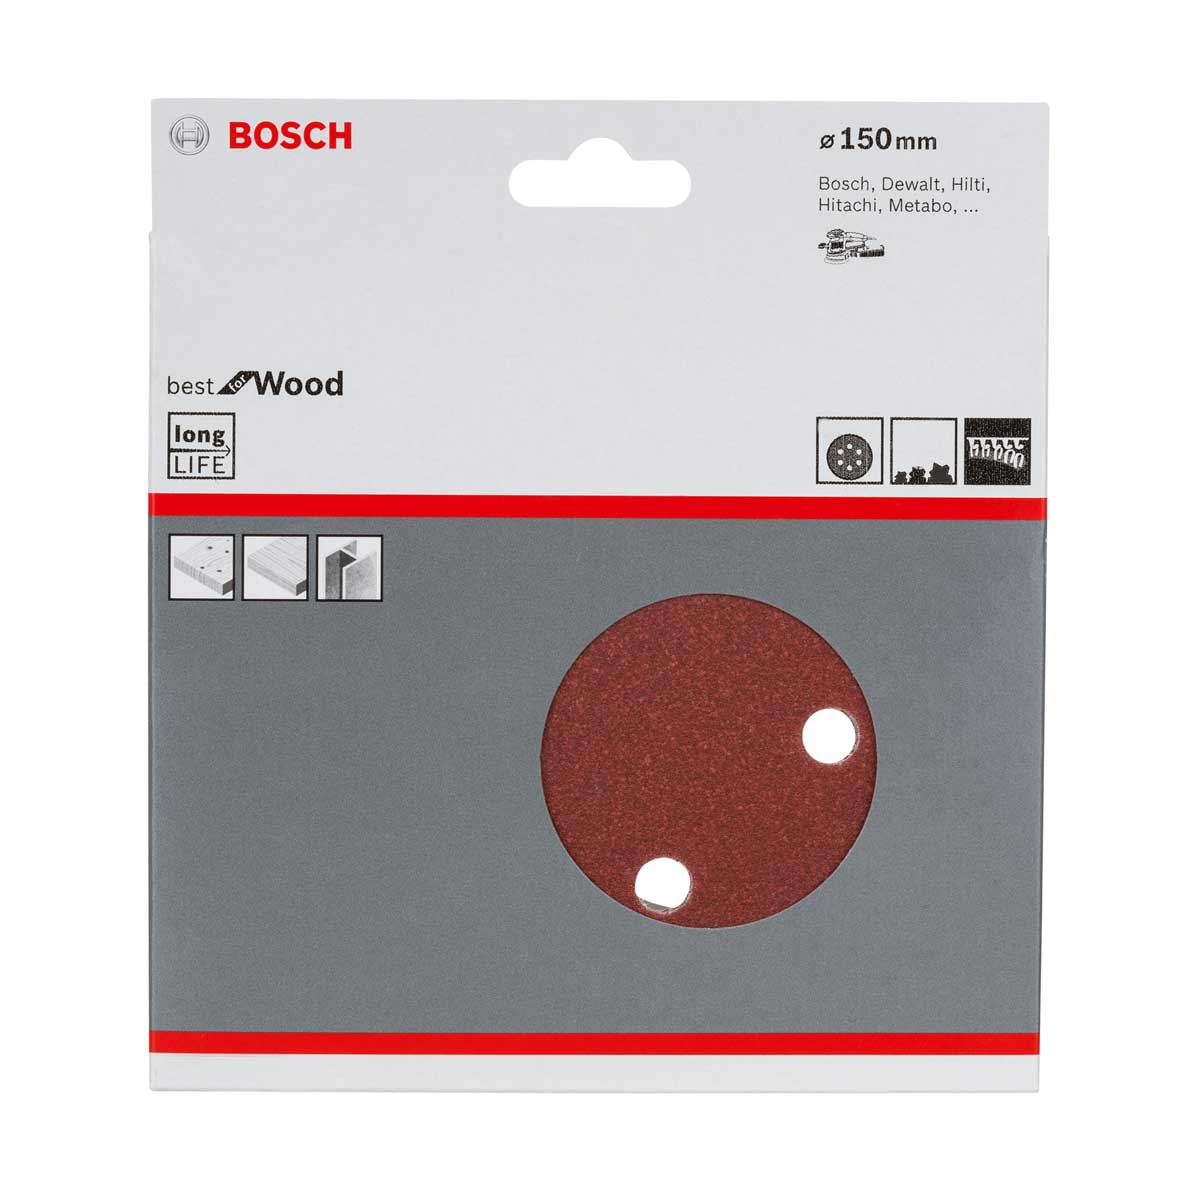 Jogo de Lixa C/ 6 Unidades 7 Pol. Bosch 150mm 2608605102